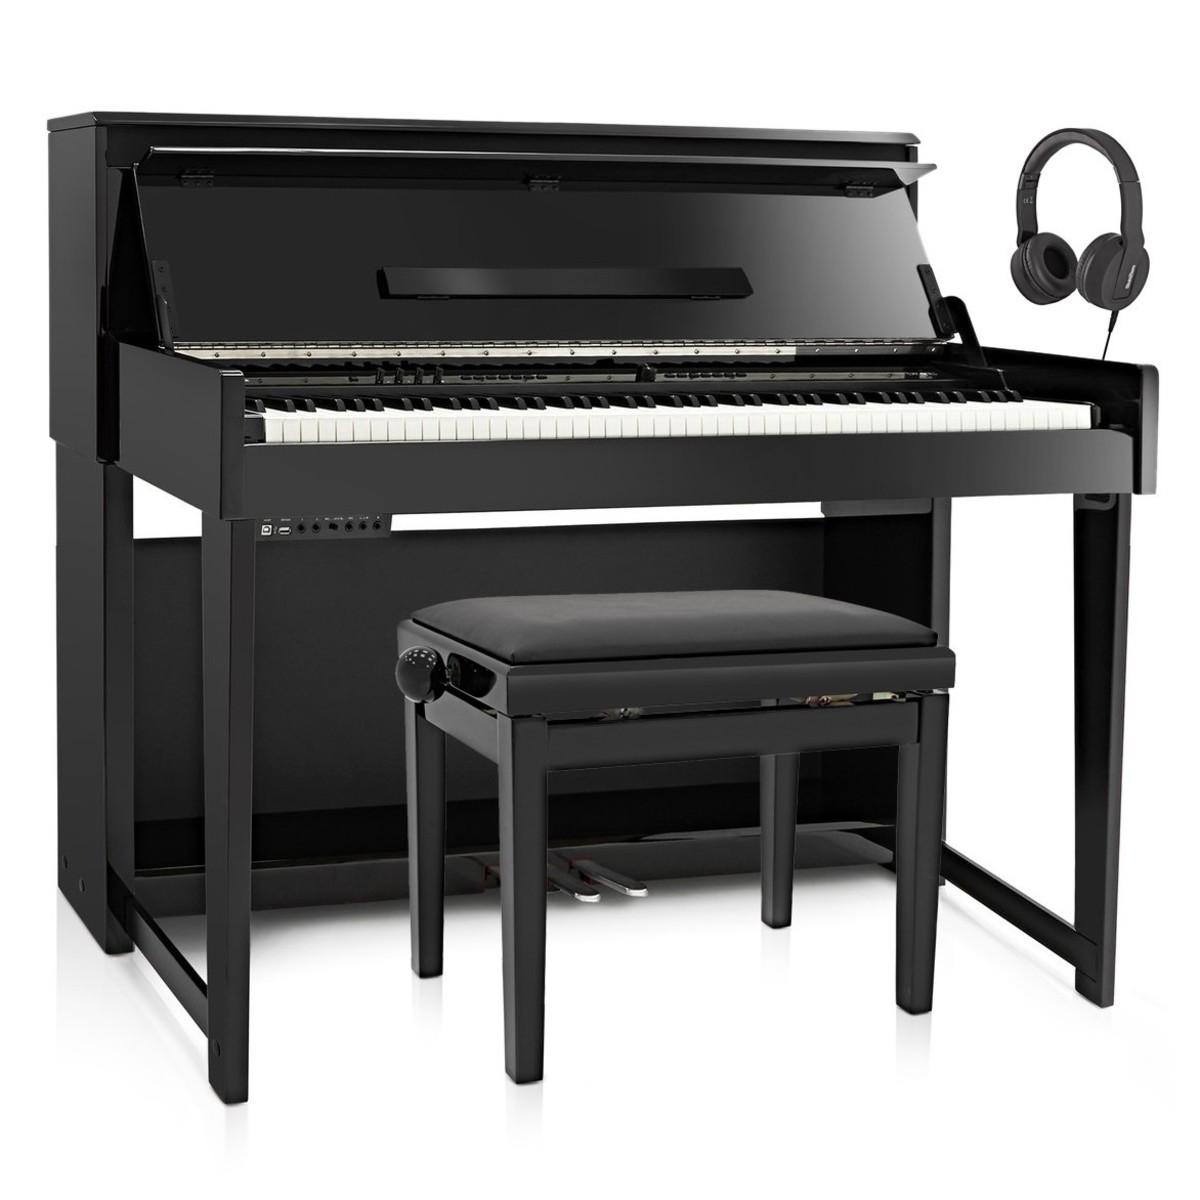 DP-90U Upright Digital Piano by Gear4music   Accessory Pack